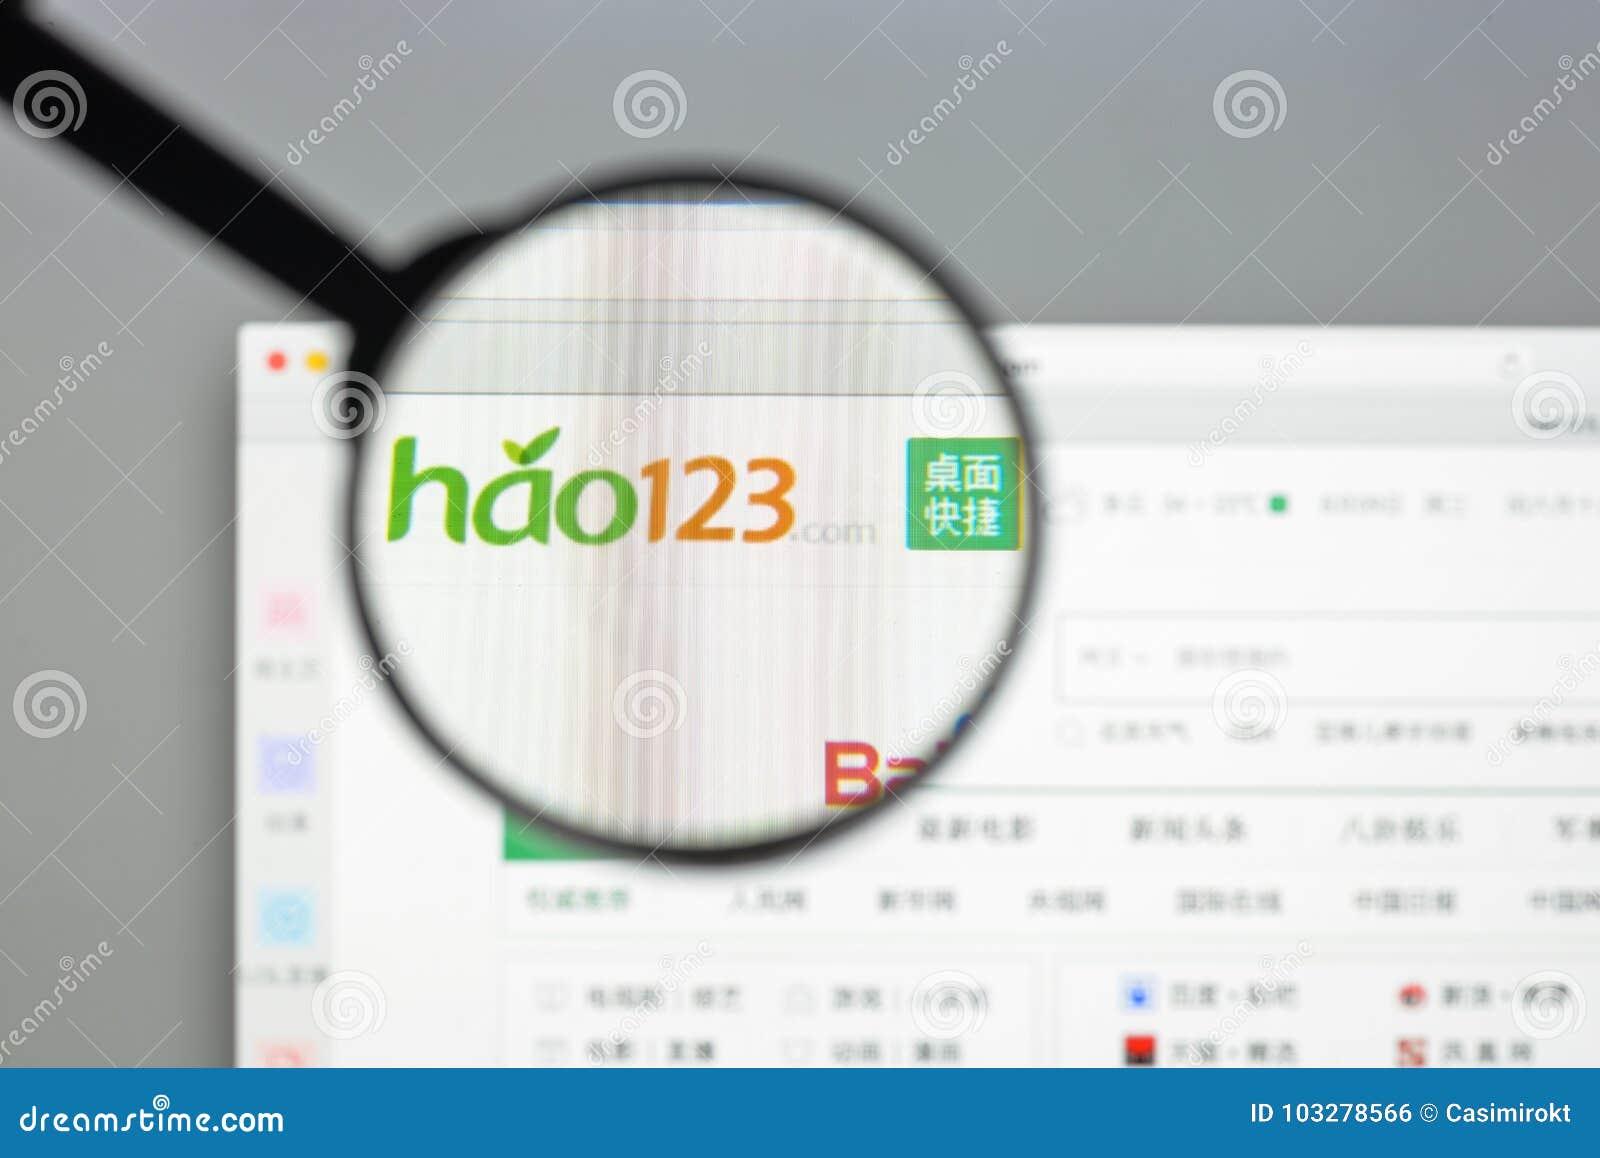 hoa123 download